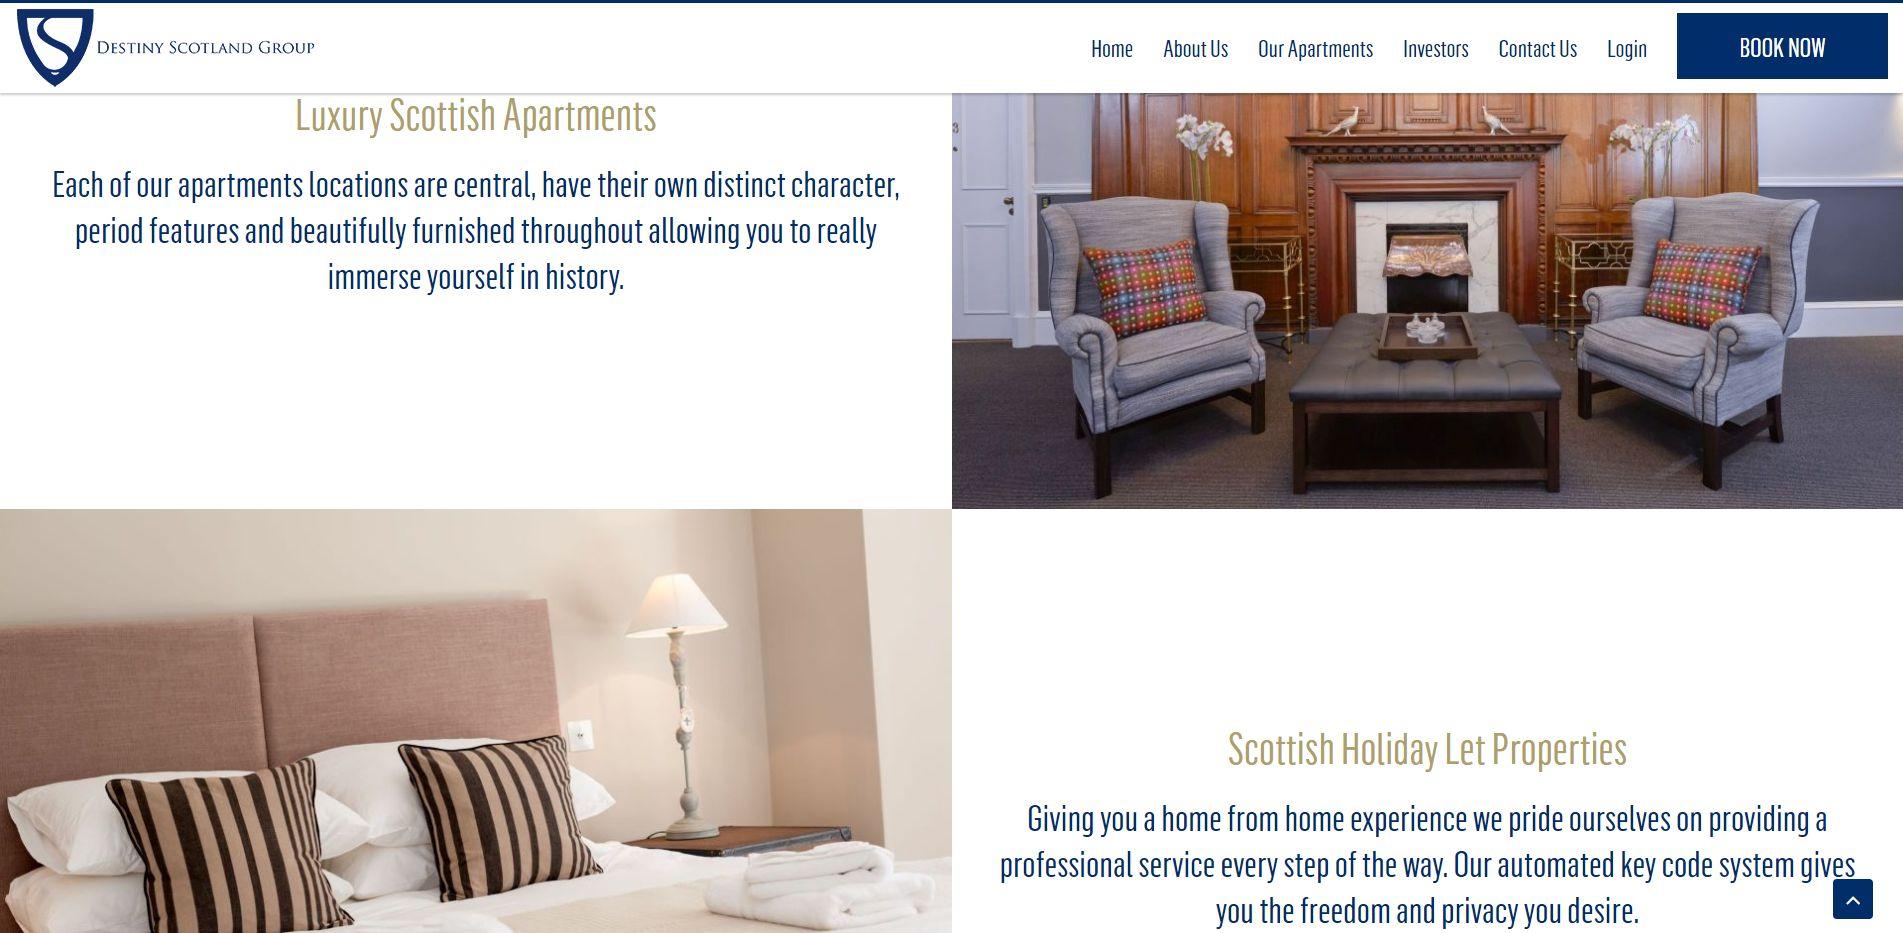 Destiny-Scotland-Luxury-Scottish-Apartments-to-Rent-1